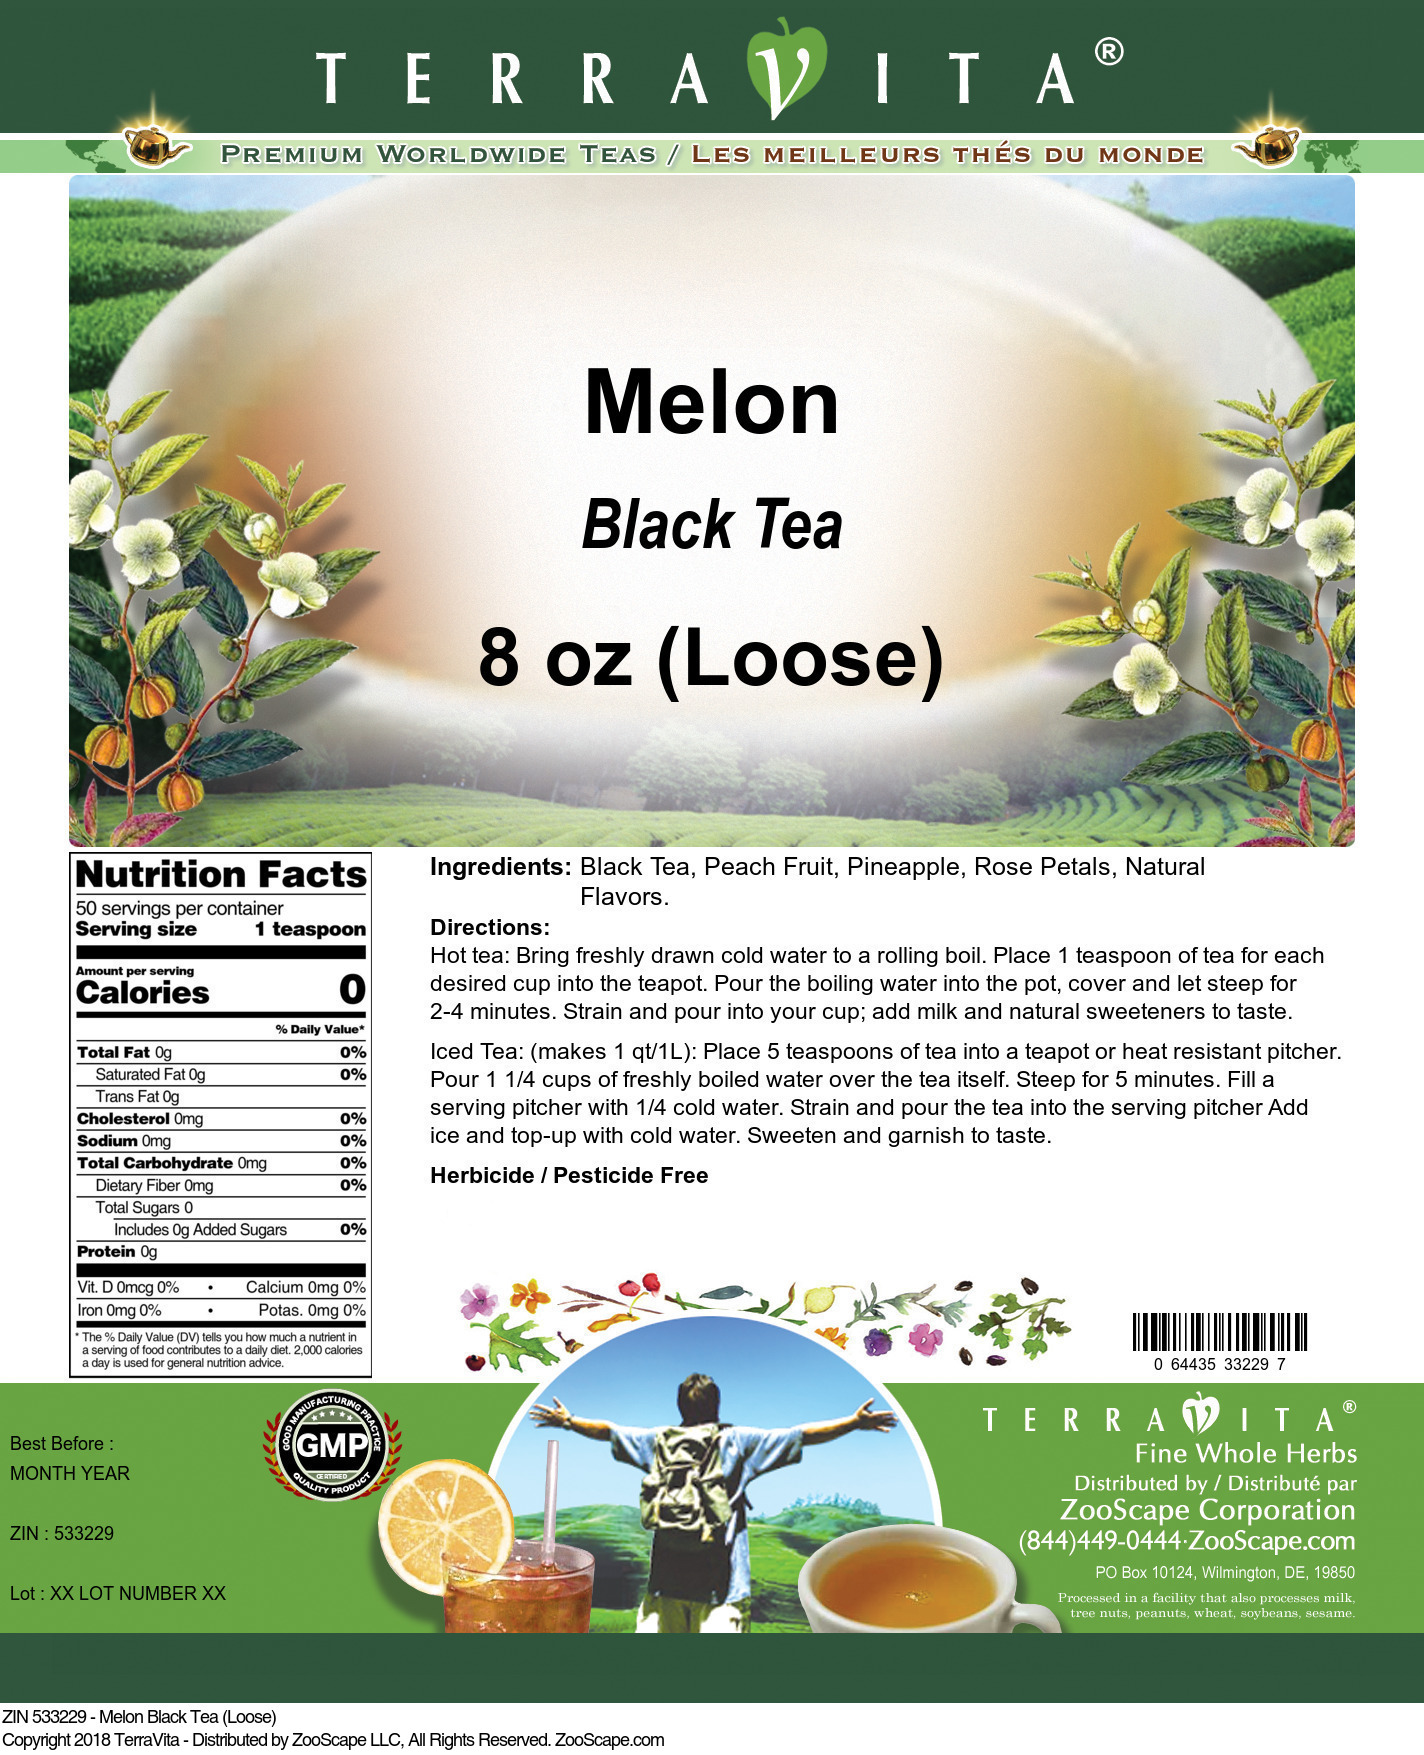 Melon Black Tea